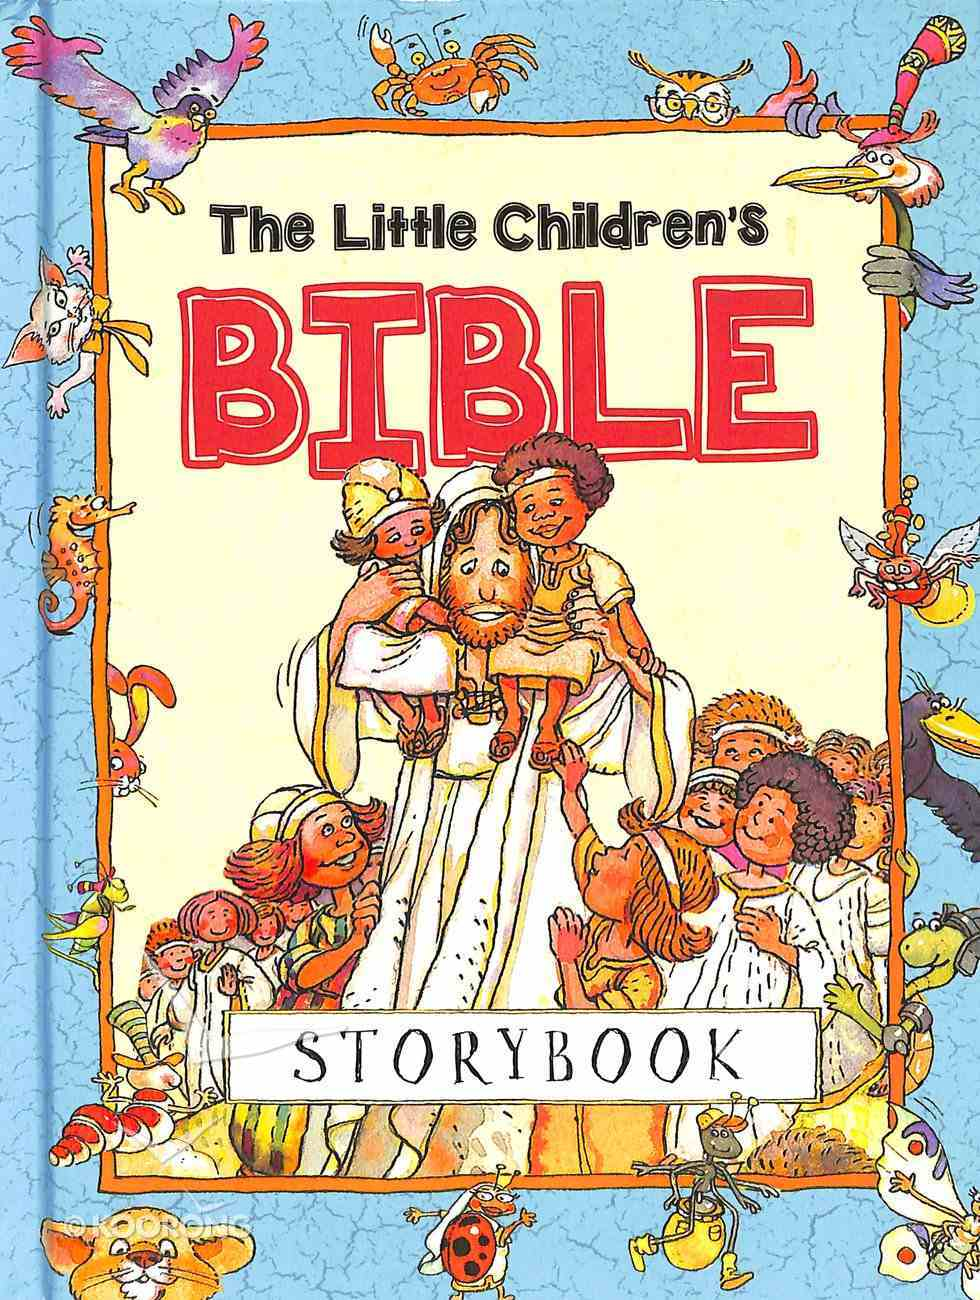 The Little Children's Bible Storybook (Abridged) Hardback